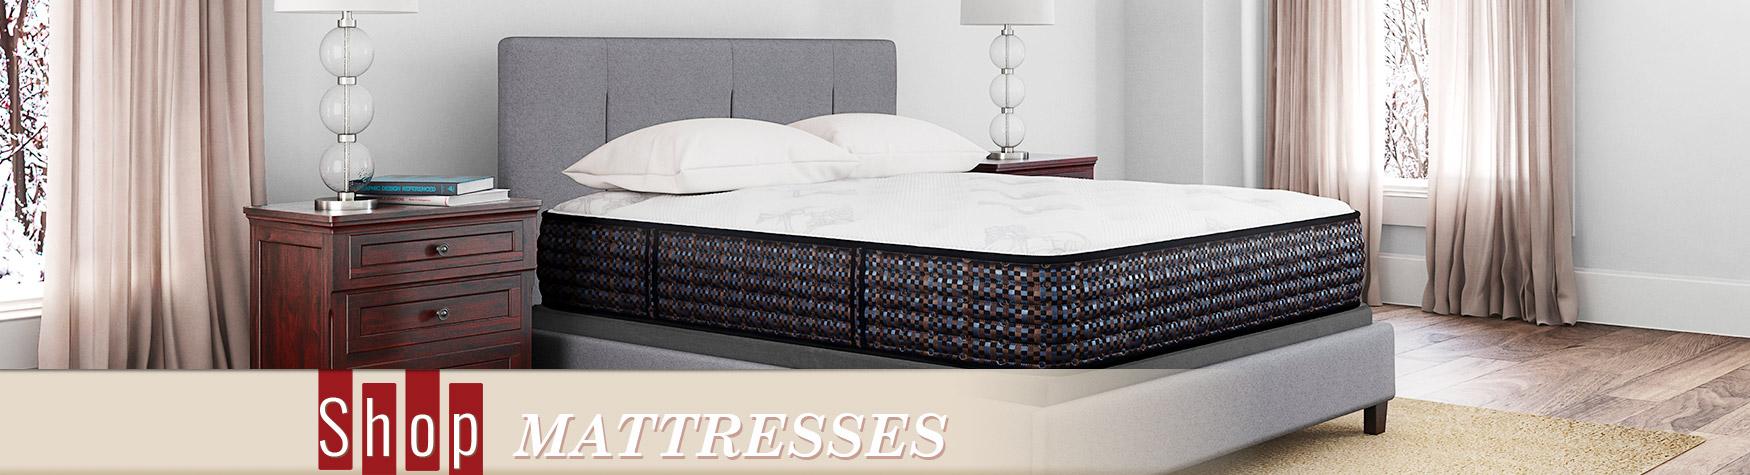 cat-mattresses.jpg